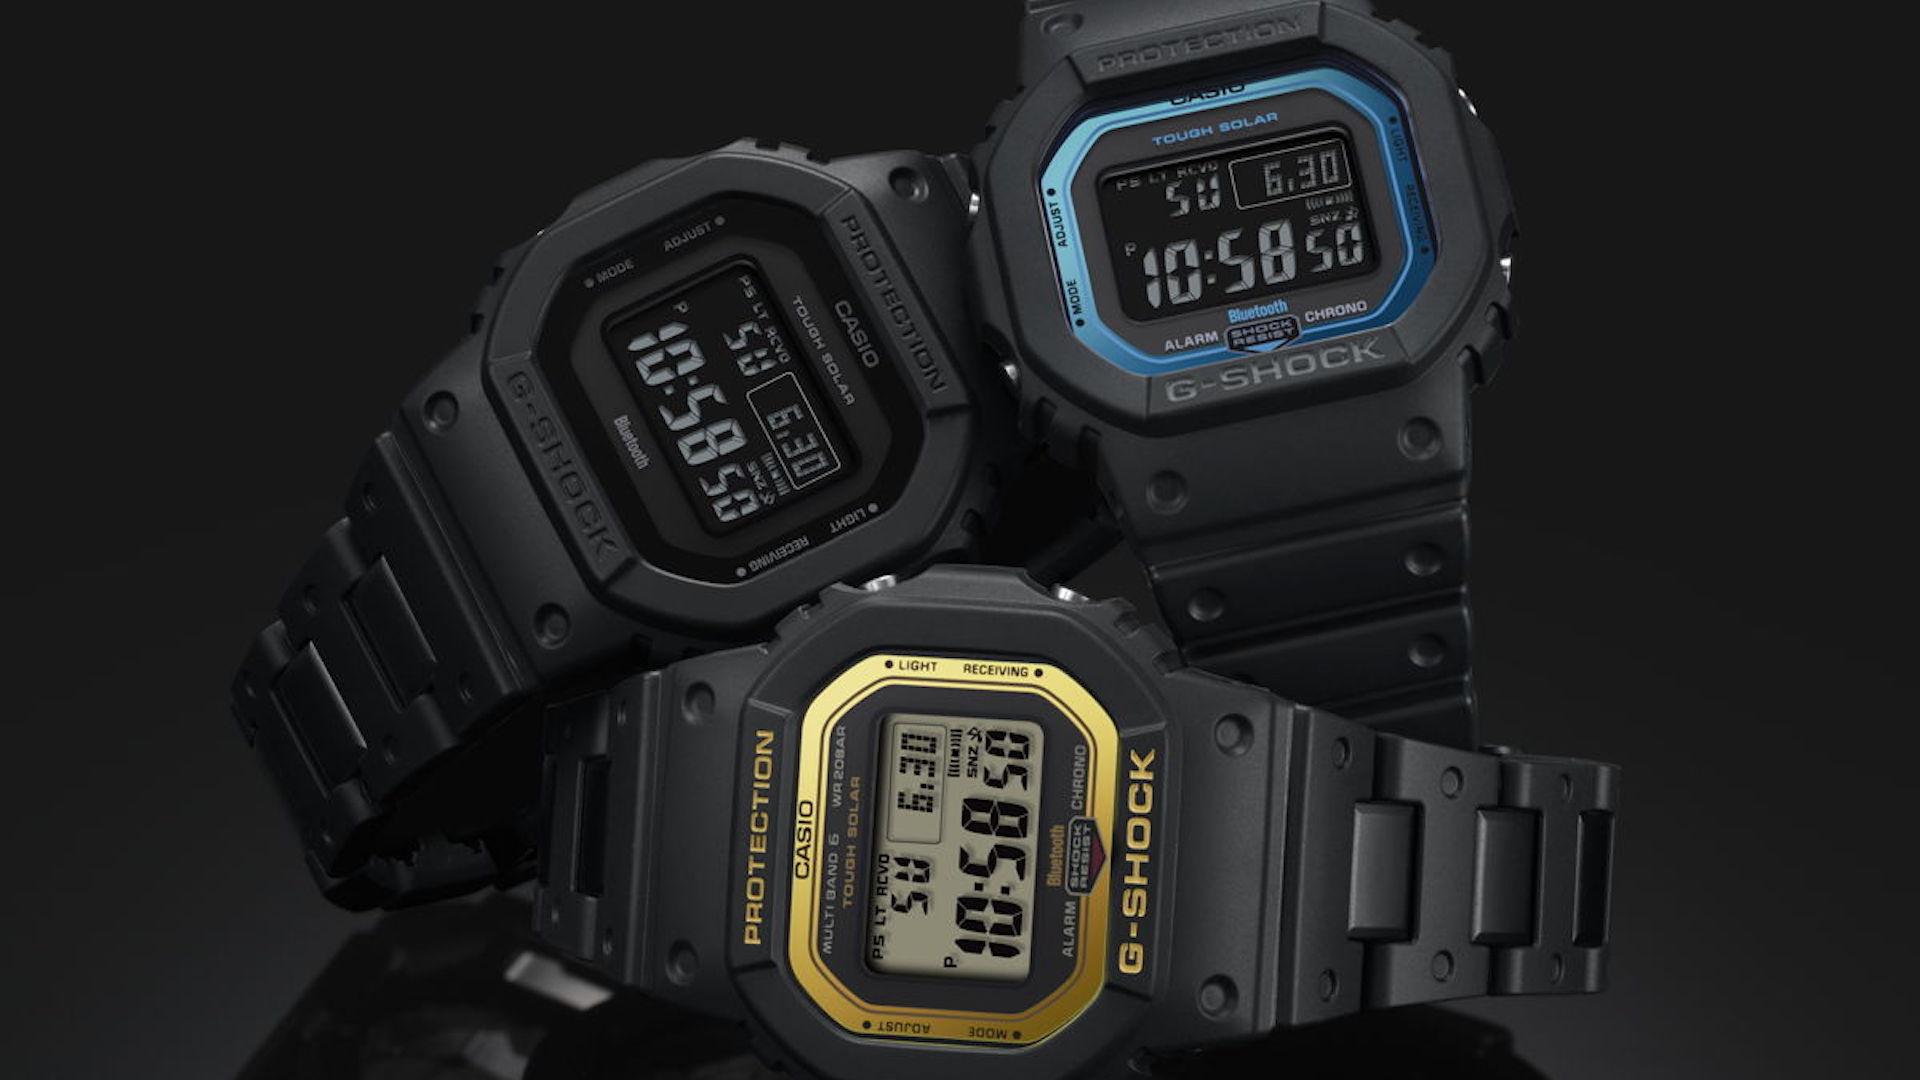 4a4b8109c21d Casio presentó su nuevo reloj G-Shock GW-B5600  Back To Origin